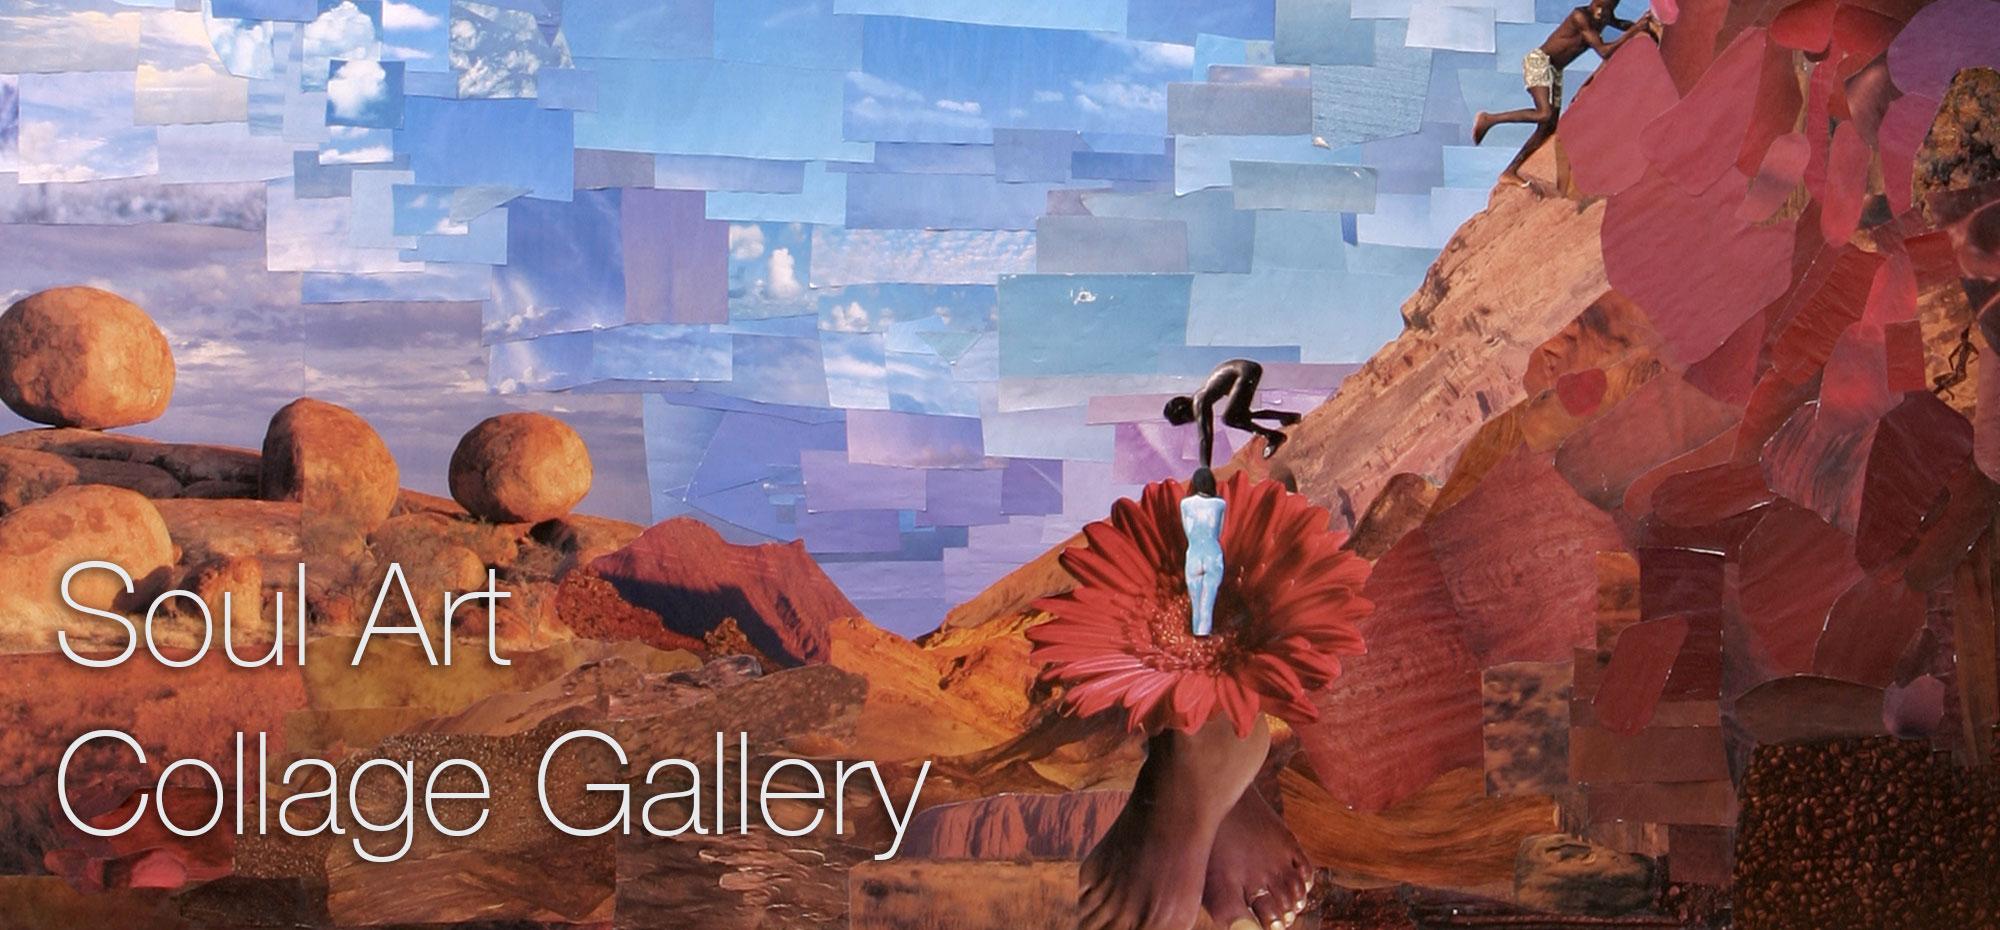 Laüra Hollick Collage Gallery